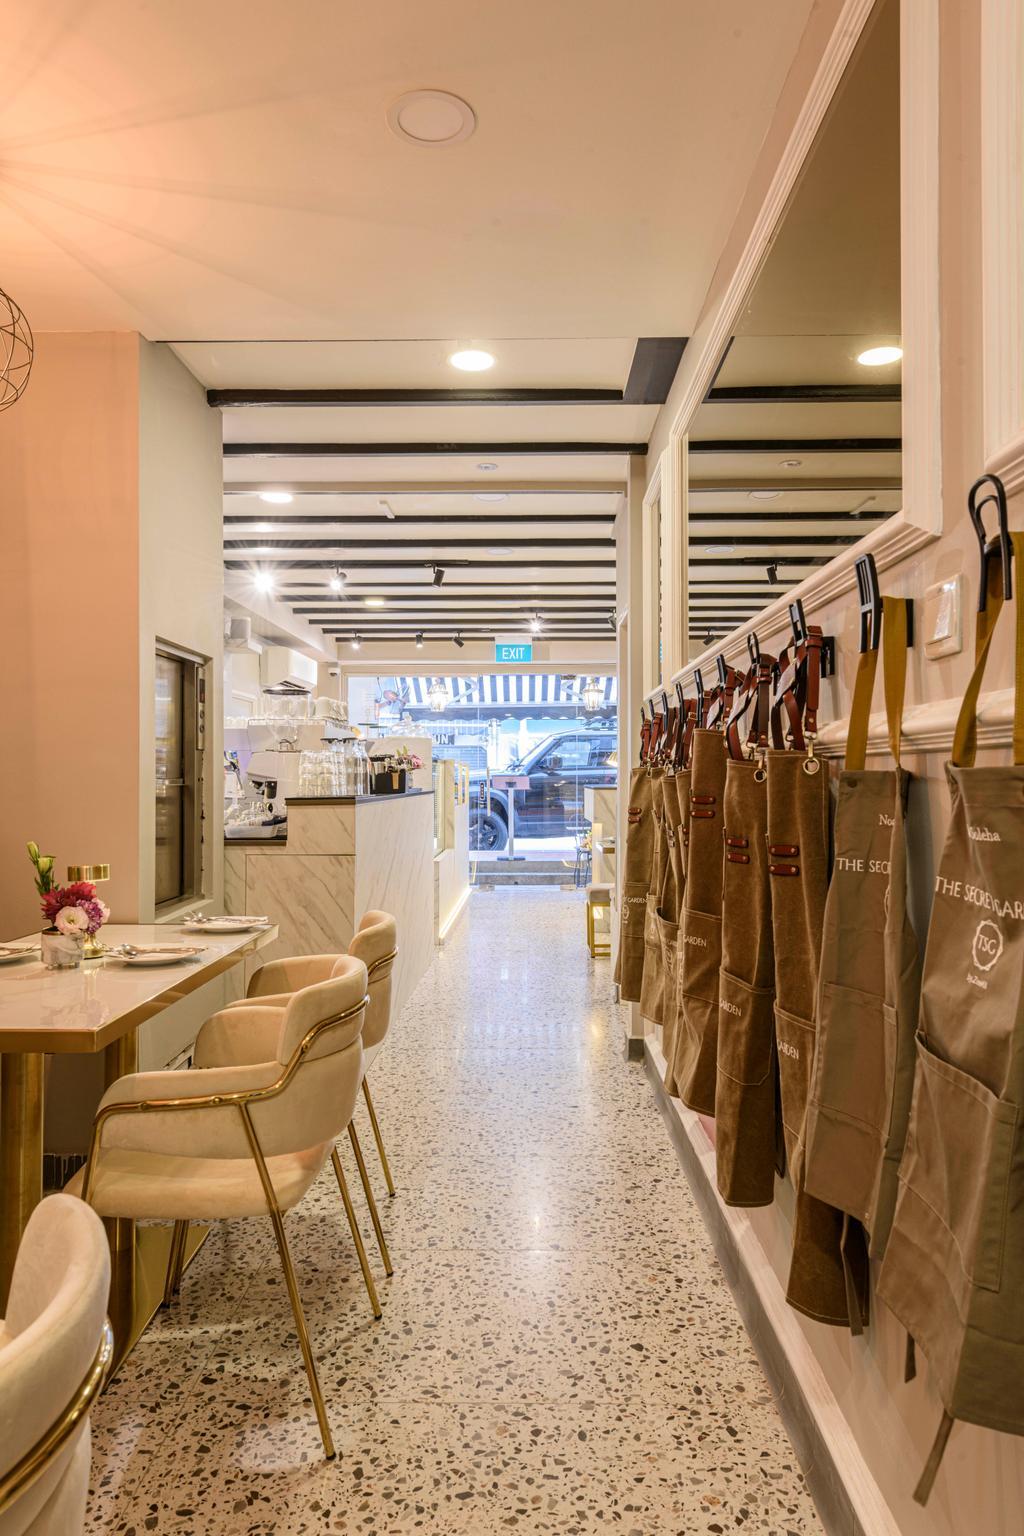 Baghdad Street, Commercial, Interior Designer, ID Gallery Interior, Eclectic, Contemporary